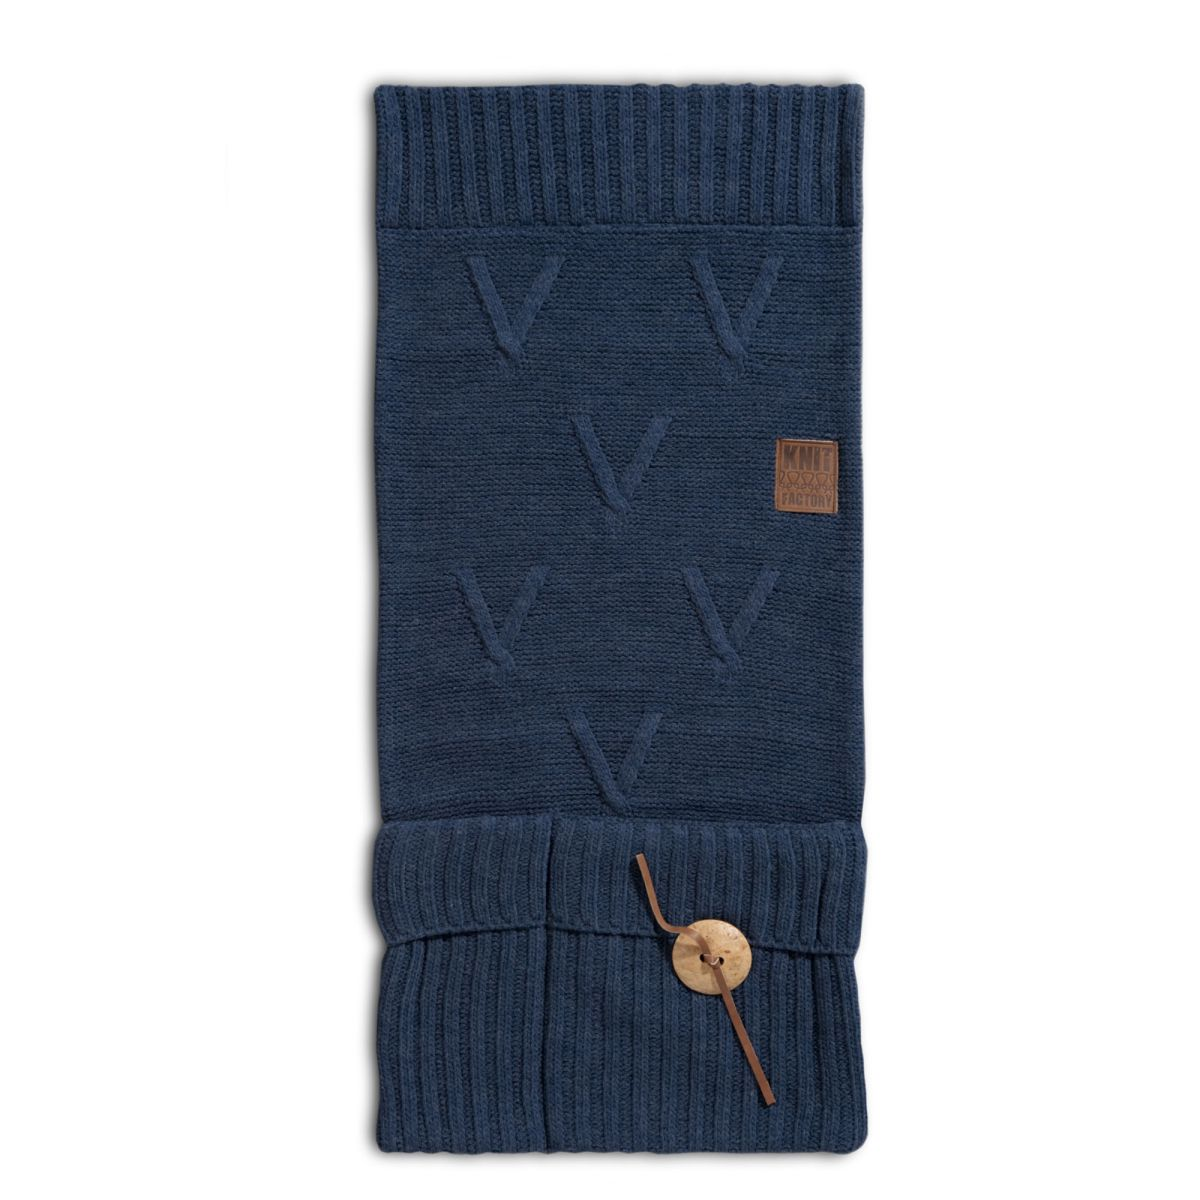 knit factory 1101013 pocket aran jeans